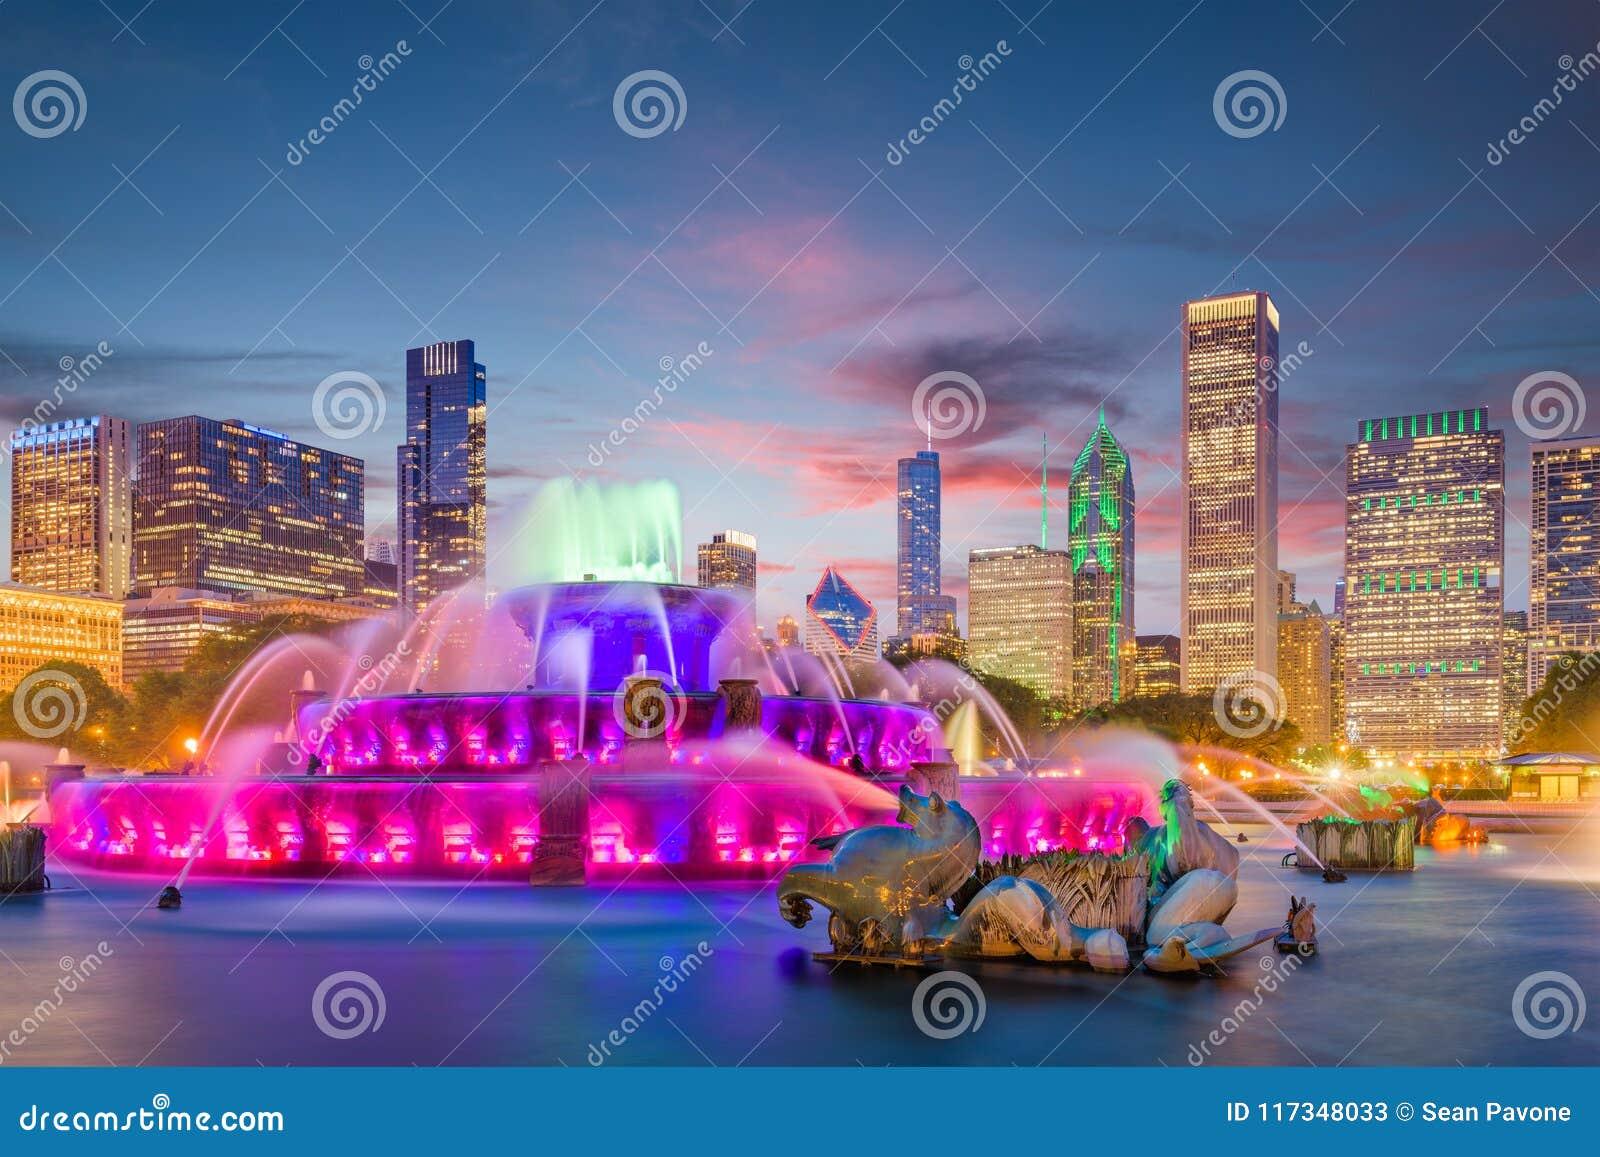 Chicago, Illinois, USA Fountain and Skyline